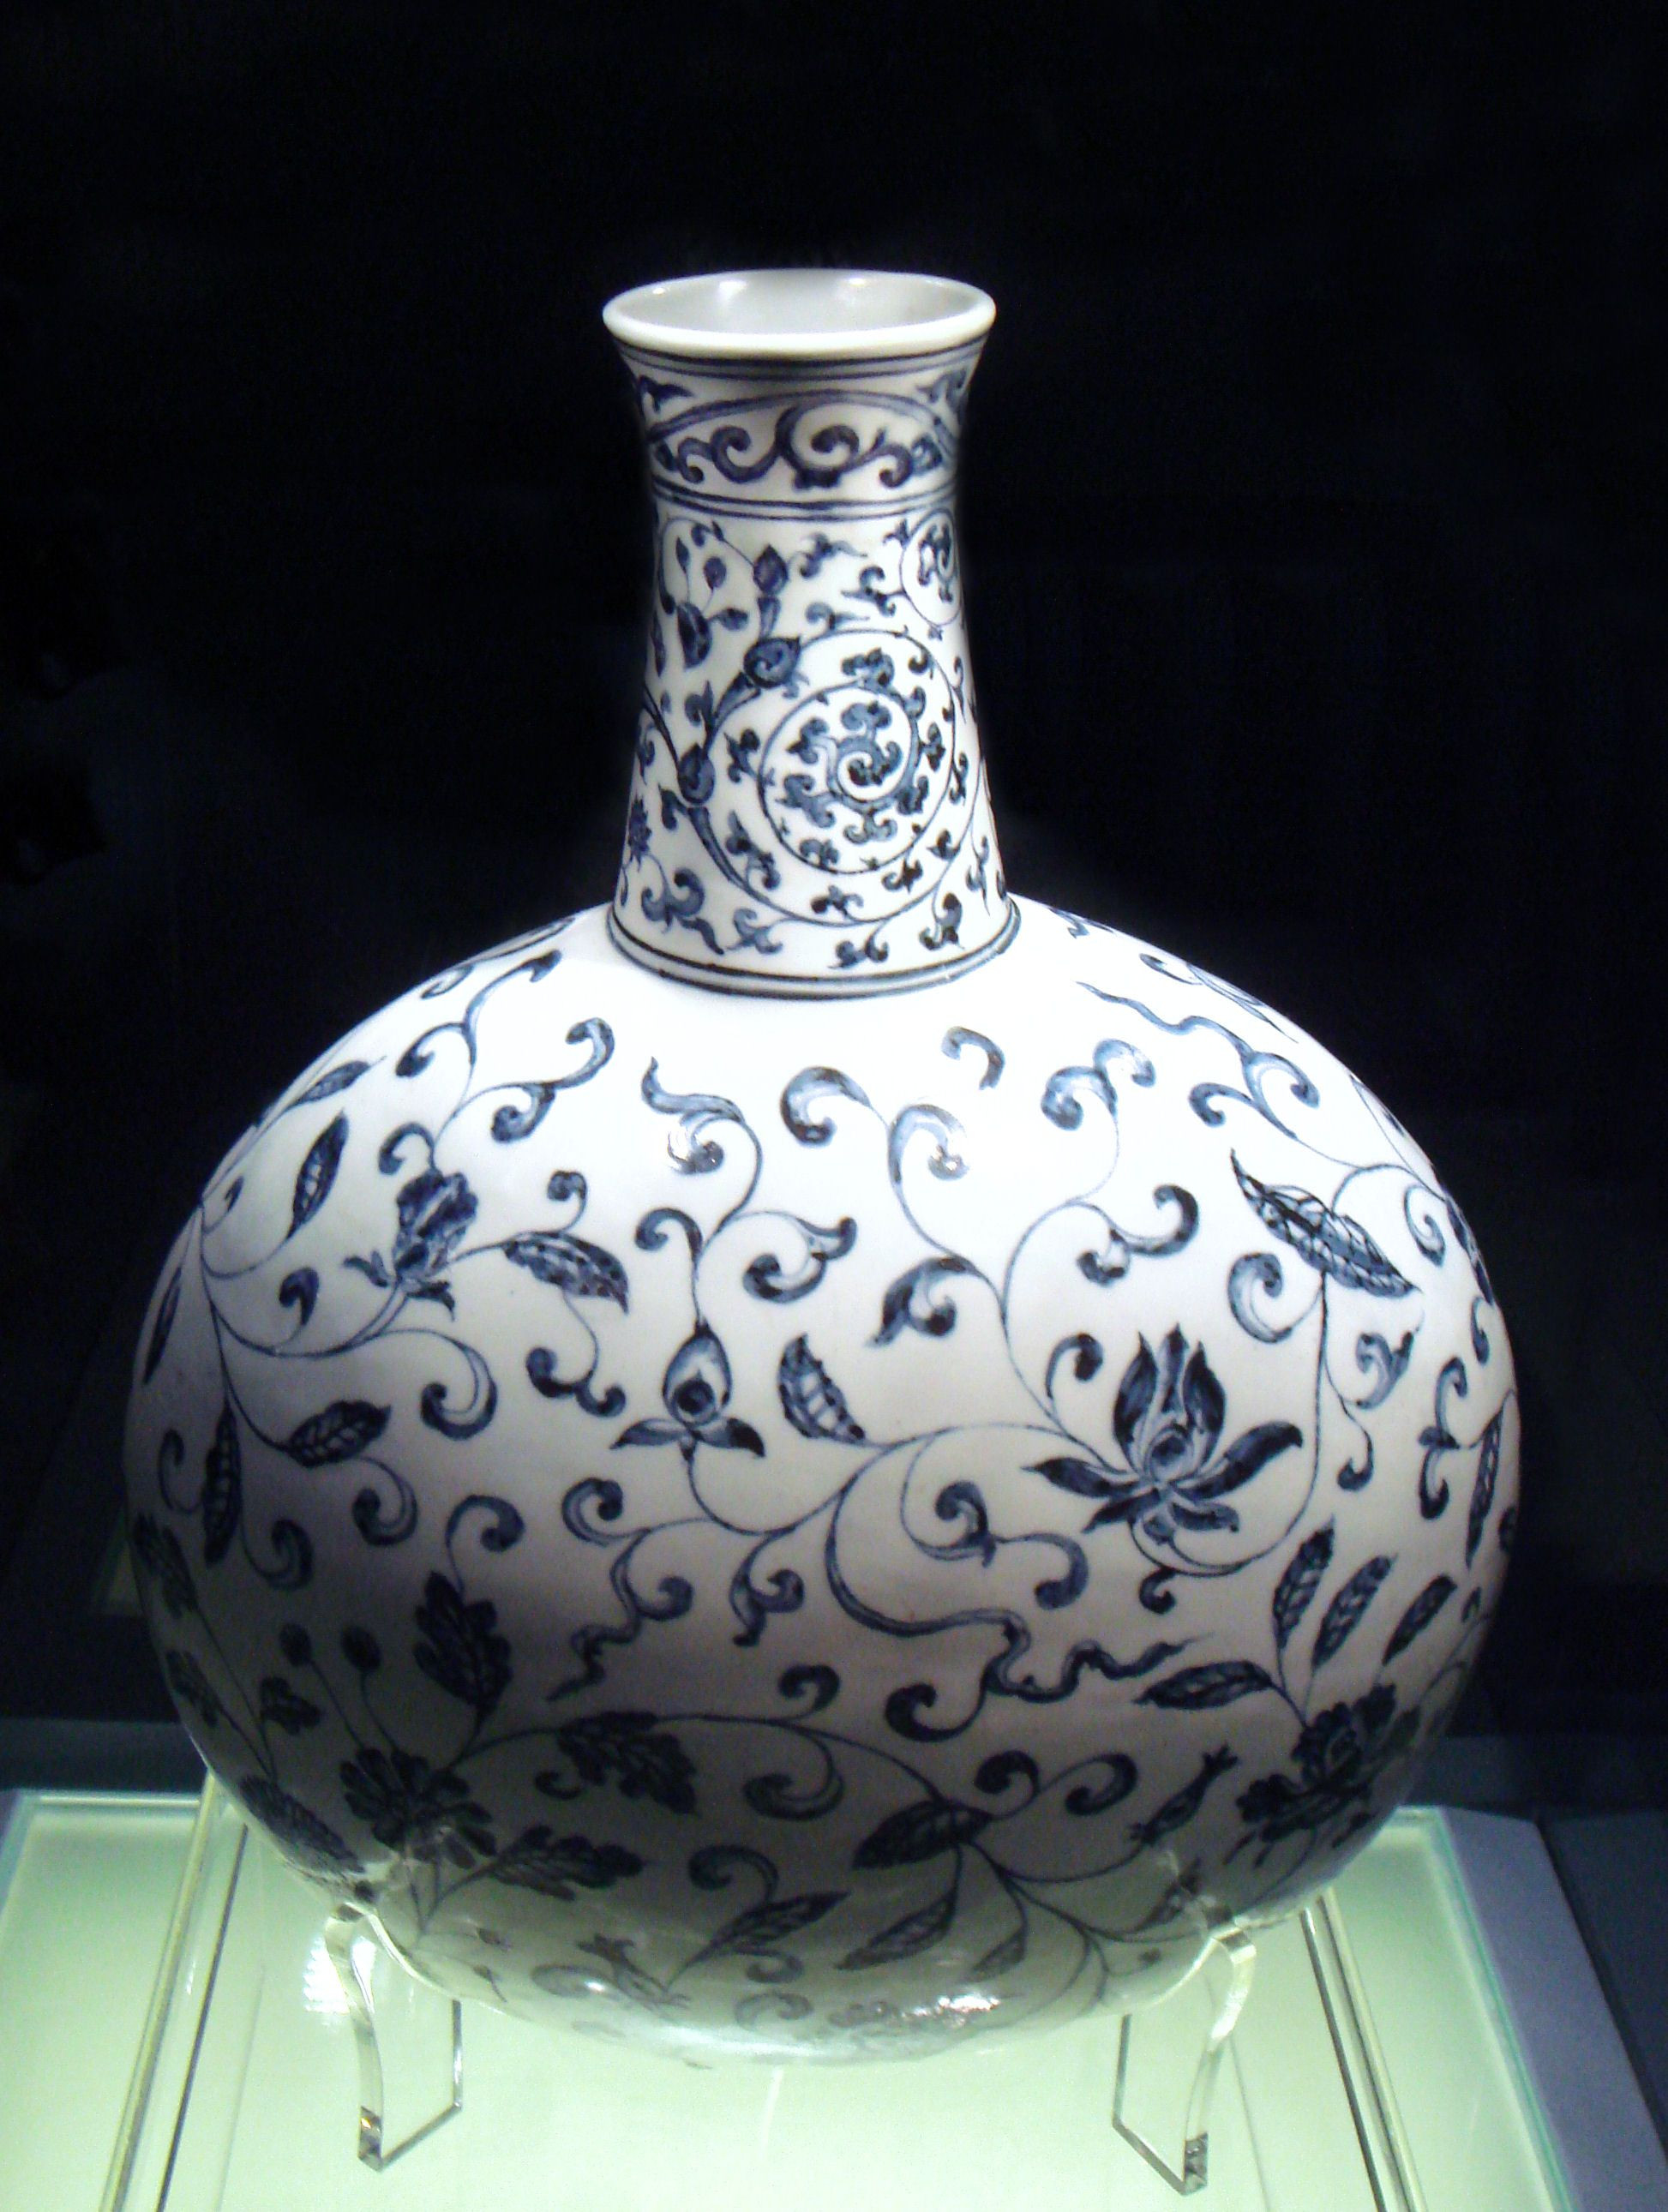 ming vases designs of blue and white ceramic vase inspirational file blue and white vase regarding blue and white ceramic vase inspirational file blue and white vase jingdezhen ming yongle 1403 1424